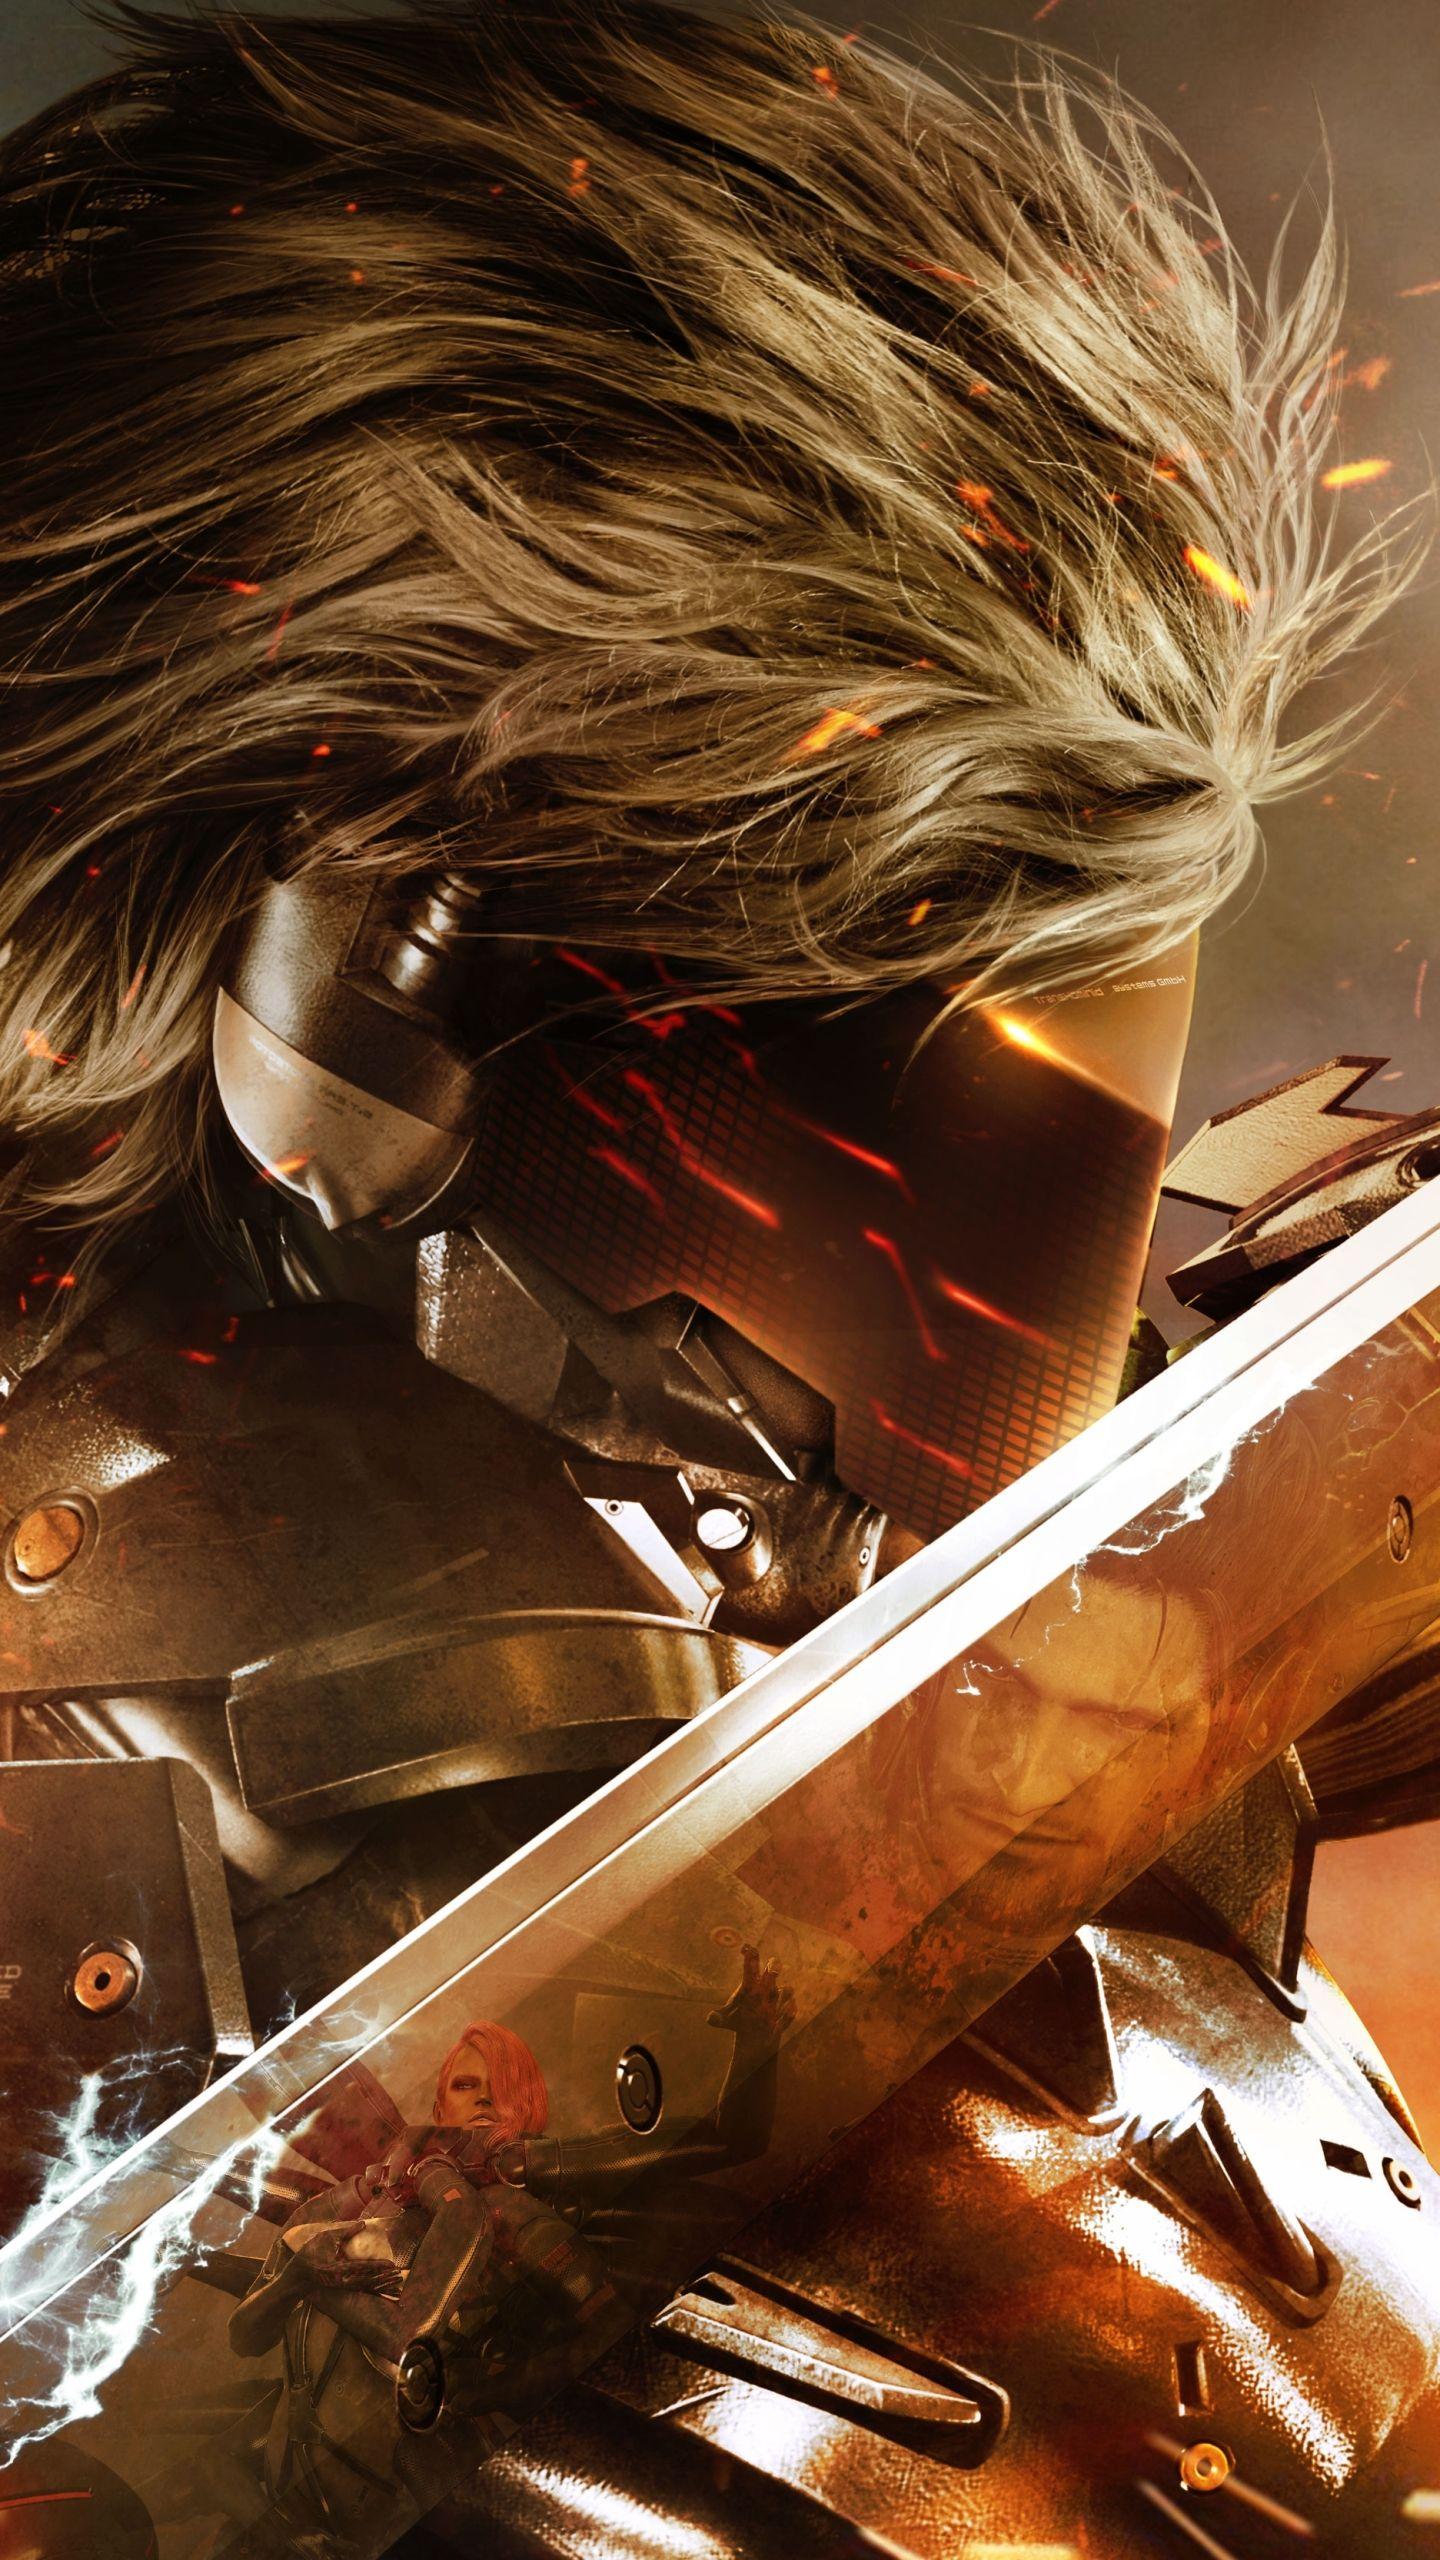 Video Game Metal Gear Rising Revengeance Metal Gear Solid Mobile Wallpaper Metal Gear Rising Metal Gear Metal Gear Solid